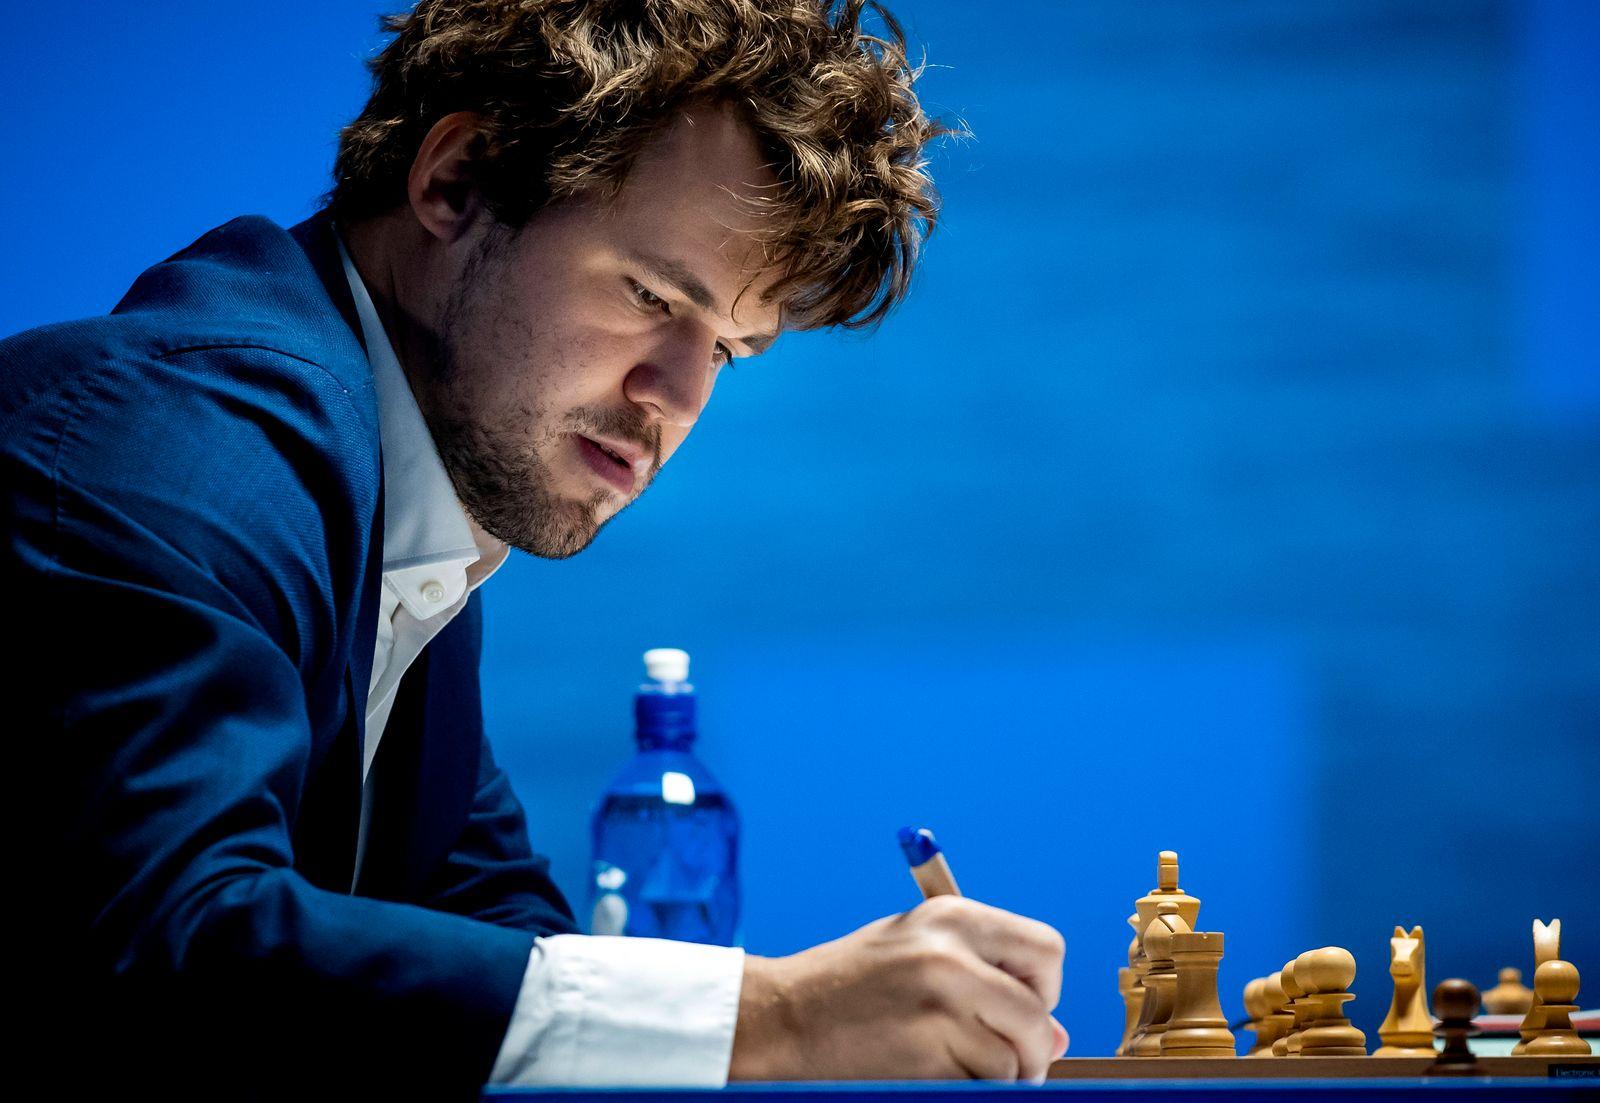 WIJK AAN ZEE - Magnus Carlsen plays against Alexander Donchenko in the fifth round of the international chess tournamen